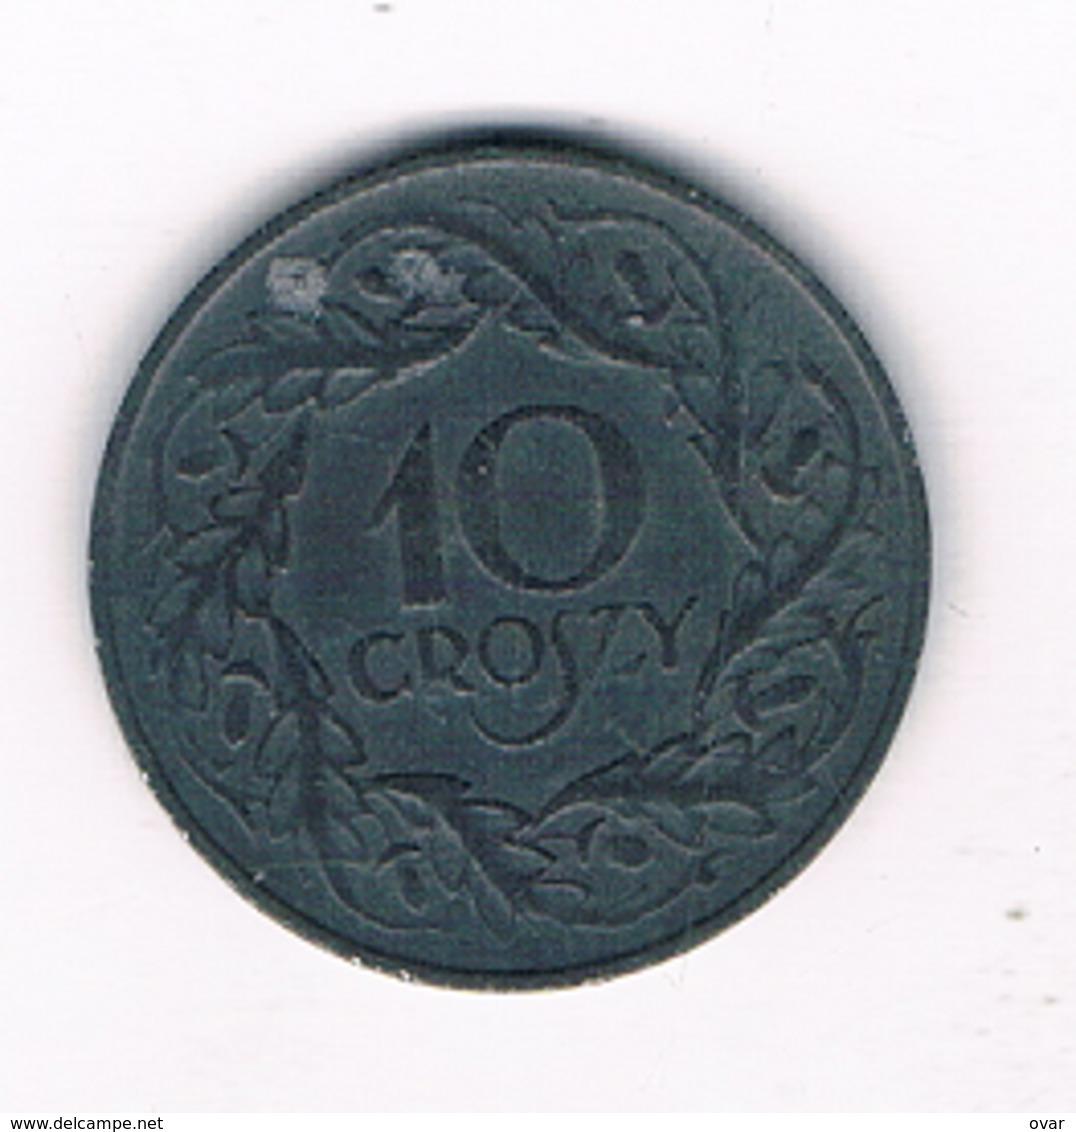 10 GROSZY 1938-1939 (gubernator) POLEN /3083/ - Poland